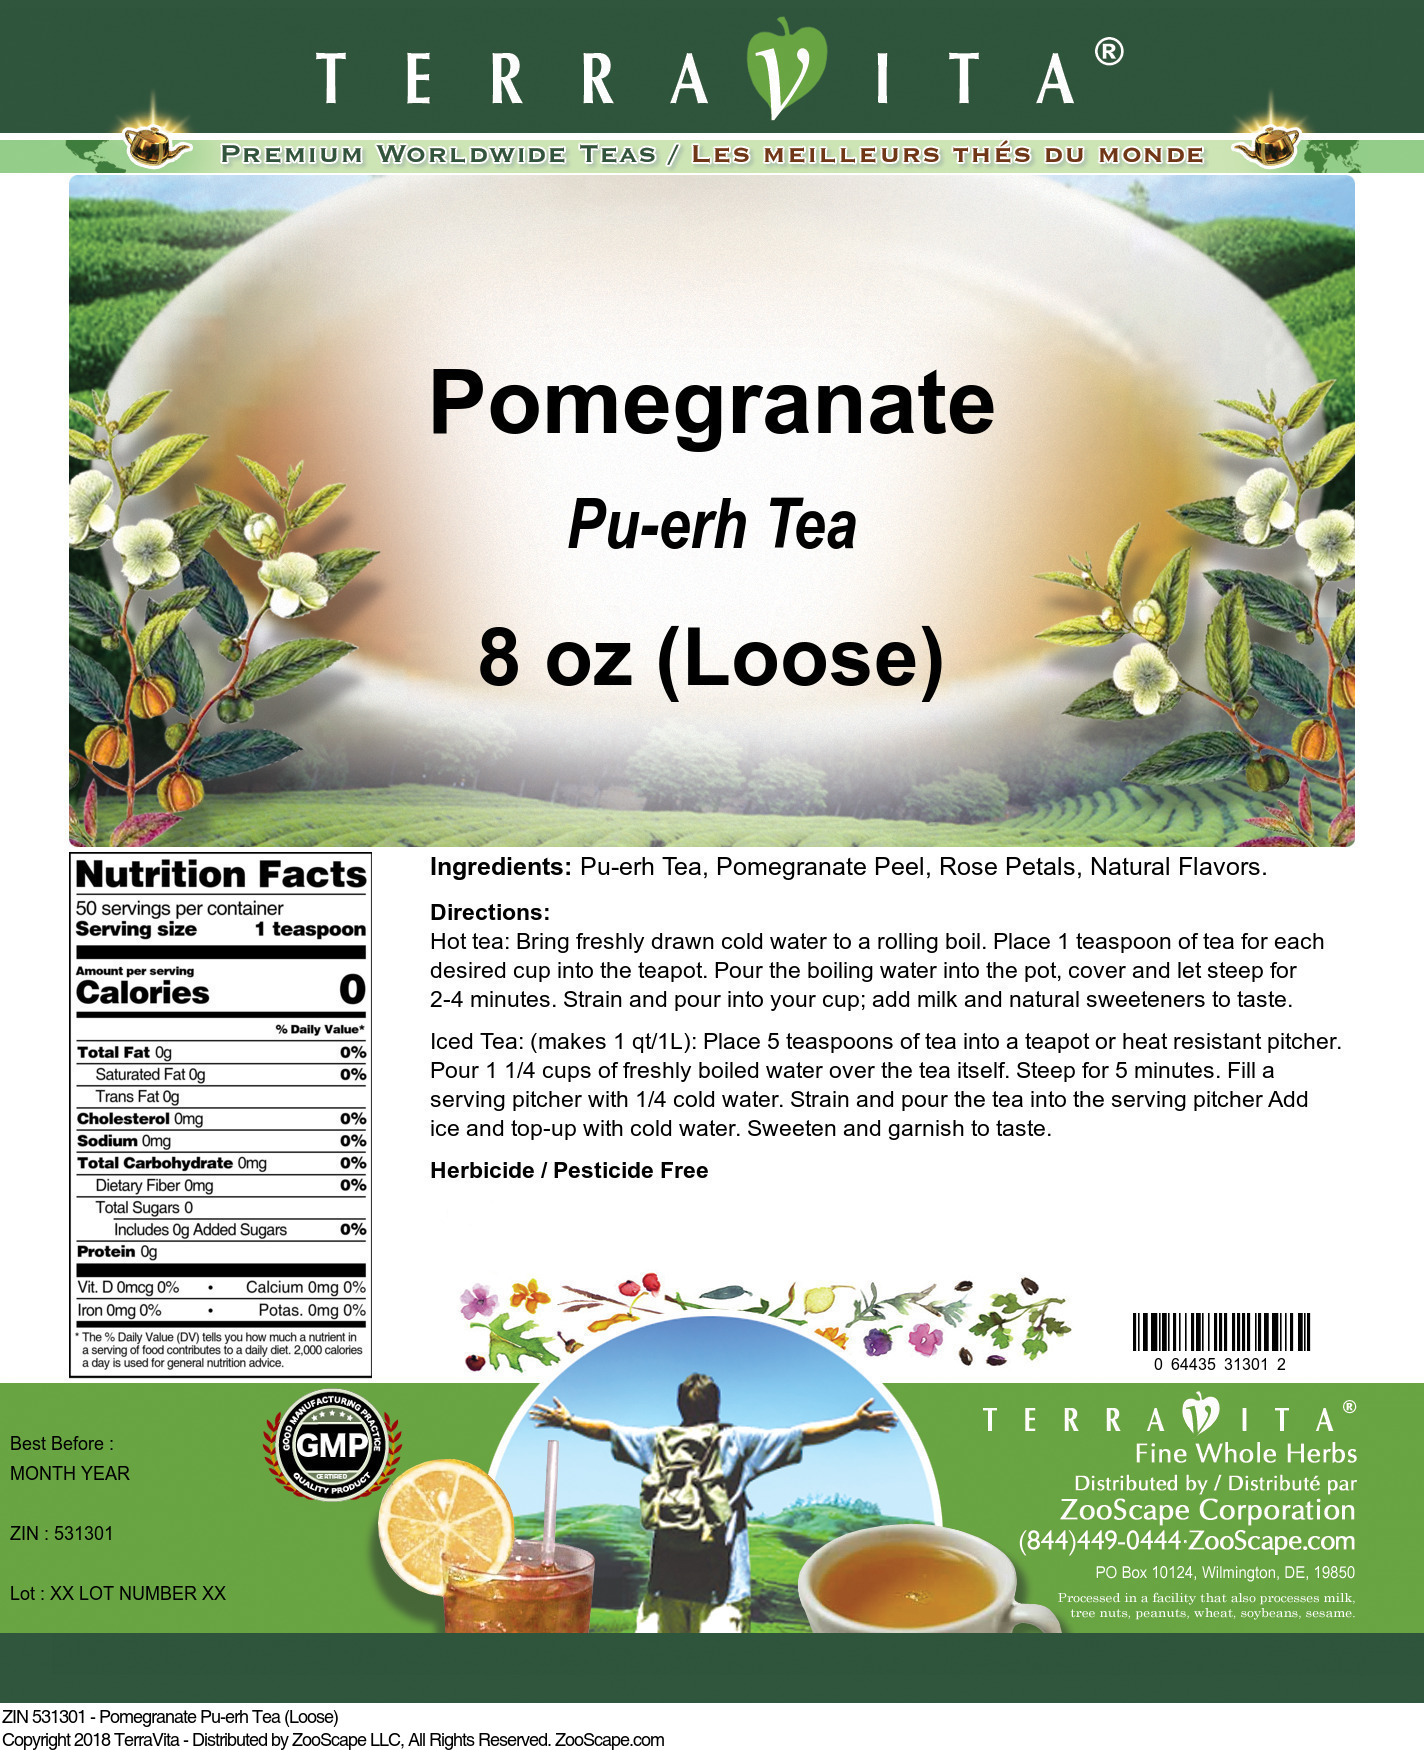 Pomegranate Pu-erh Tea